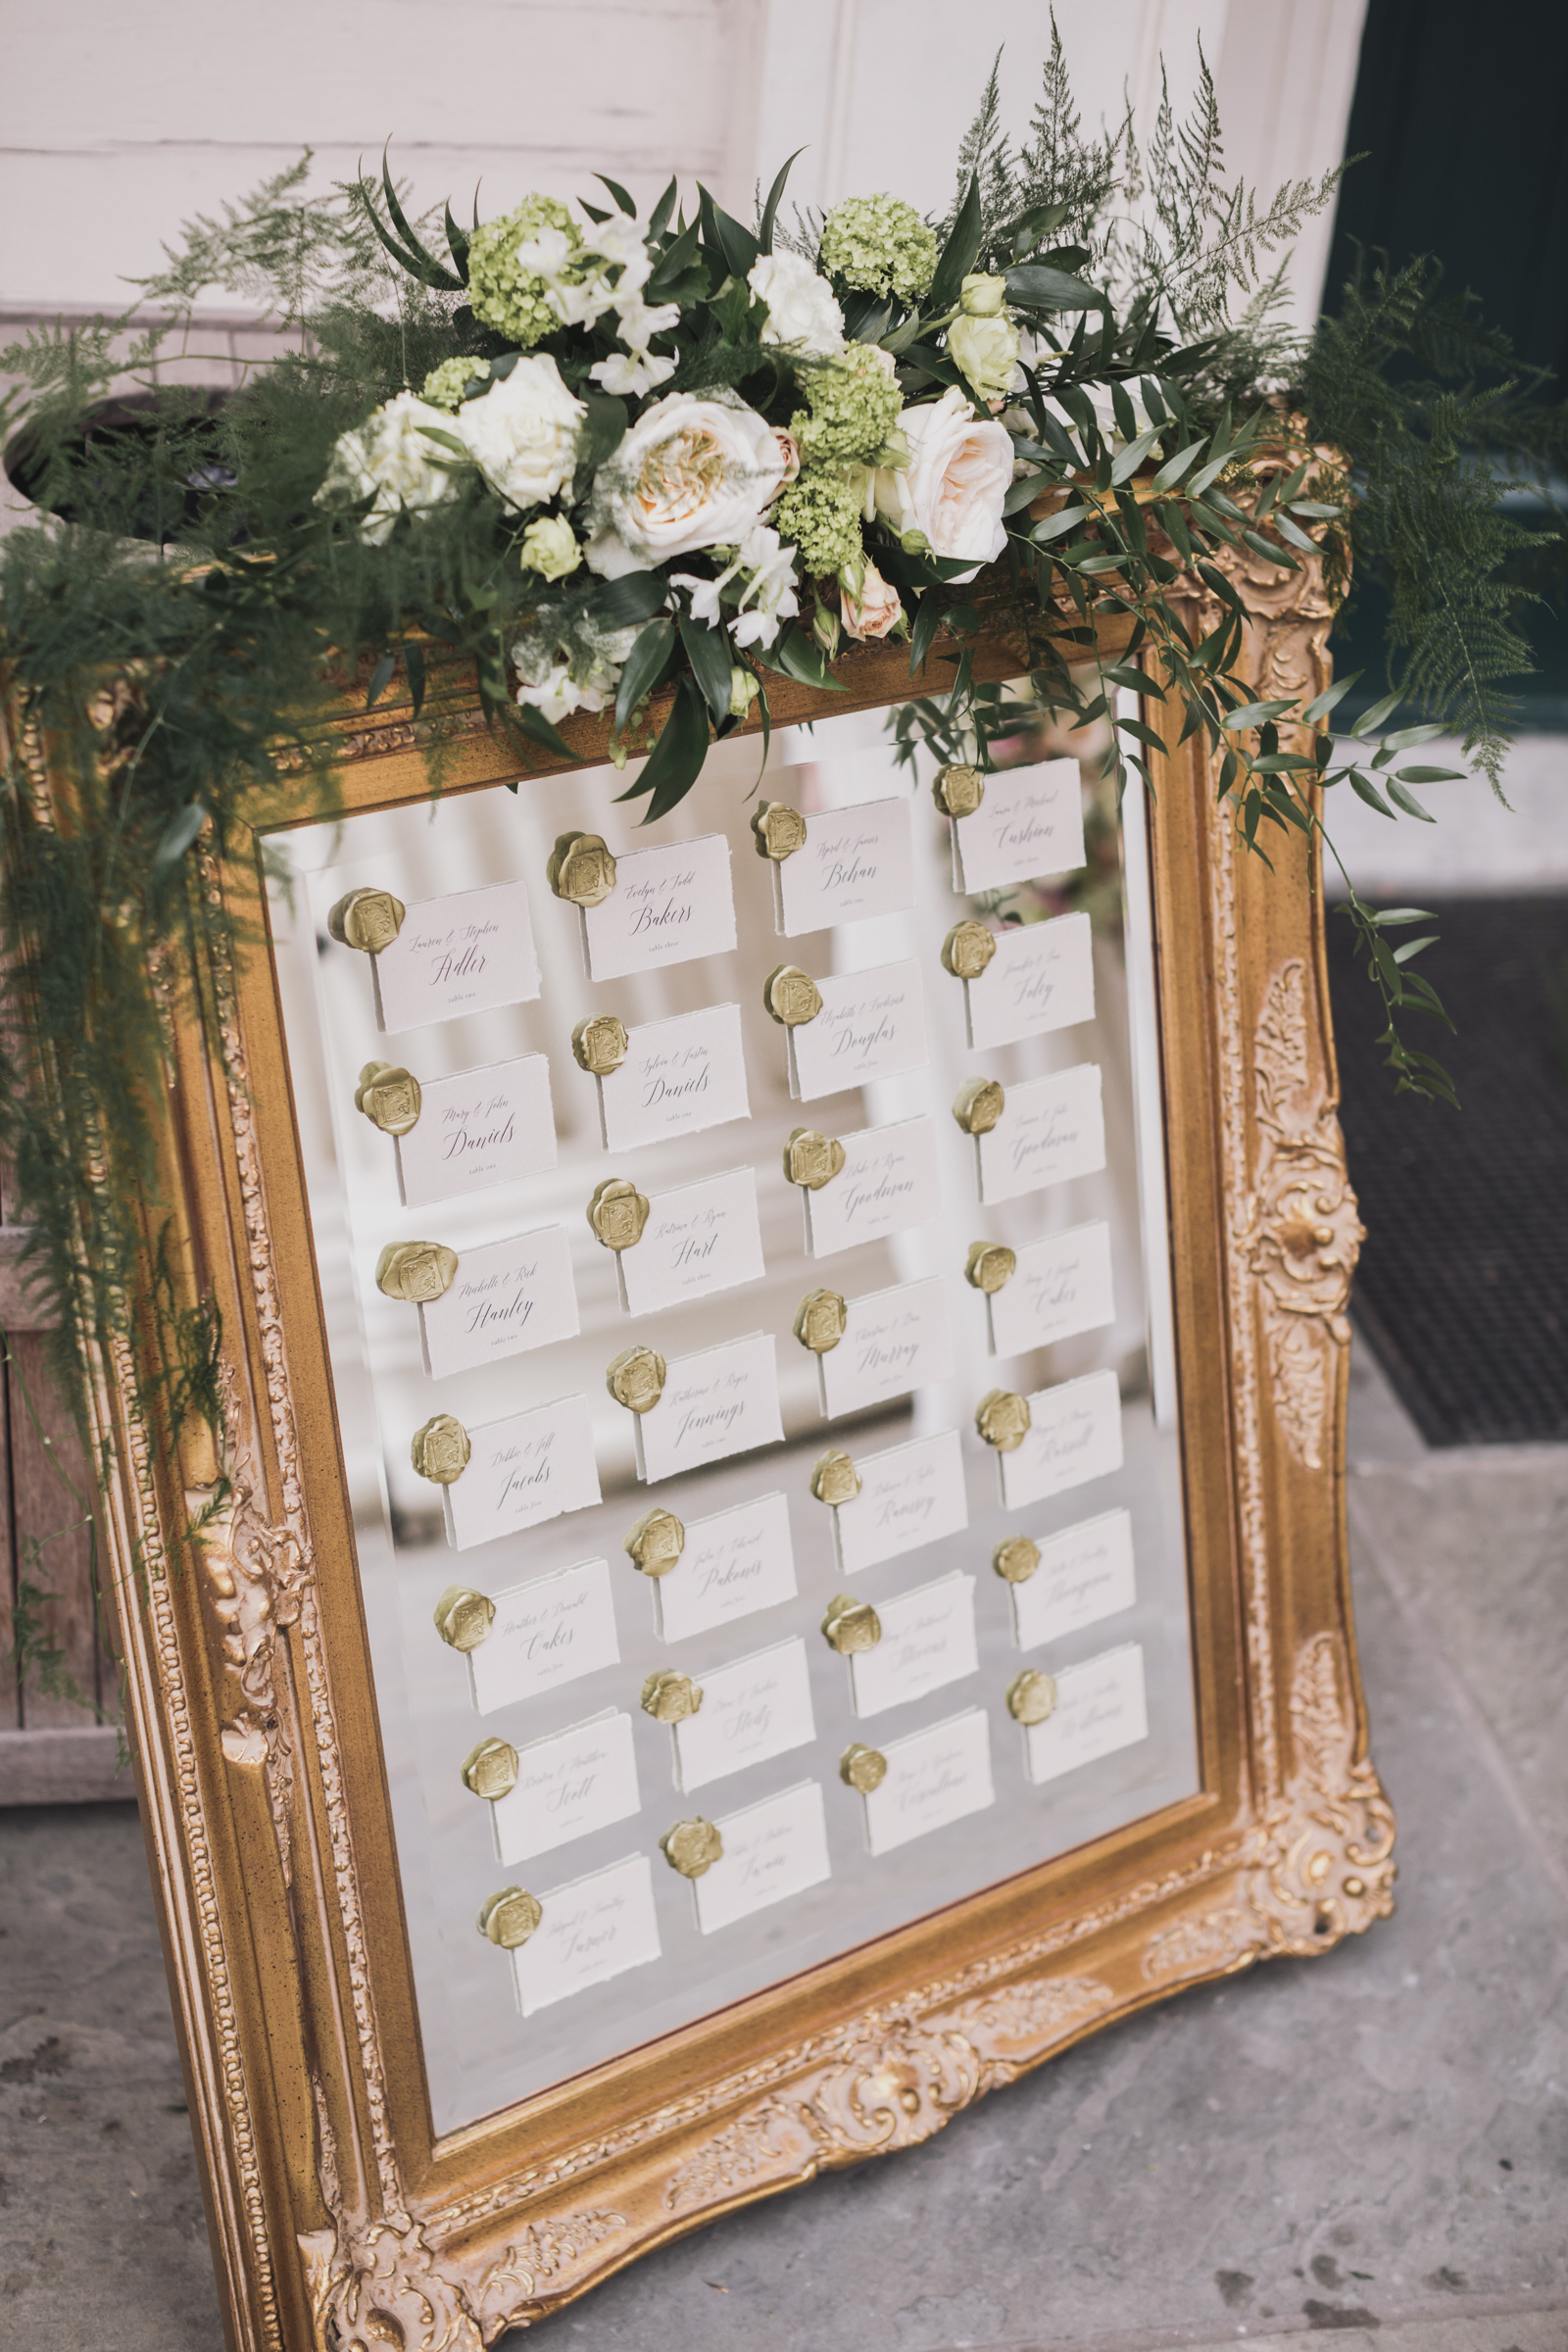 20160310-094-Barrow_Mansion_Wedding_Editorial.jpg